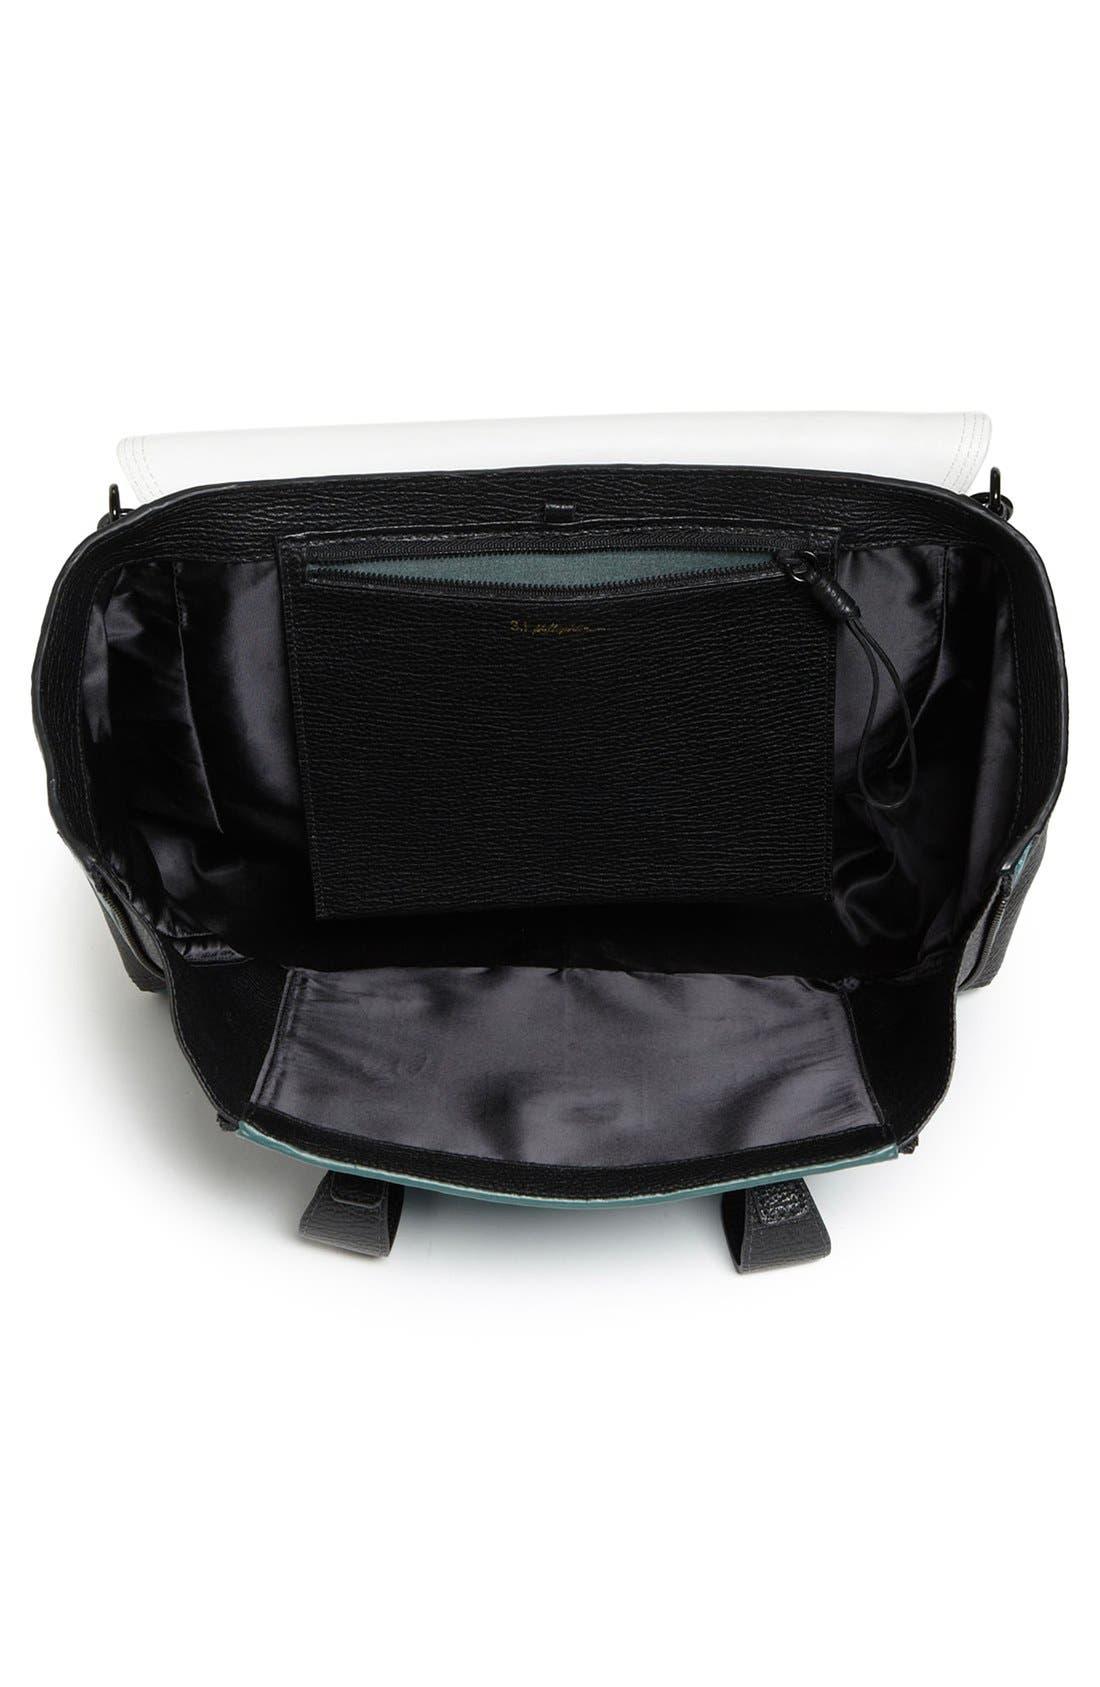 Alternate Image 3  - 3.1 Phillip Lim 'Pashli' Colorblock Leather Crossbody Satchel (Nordstrom Exclusive)